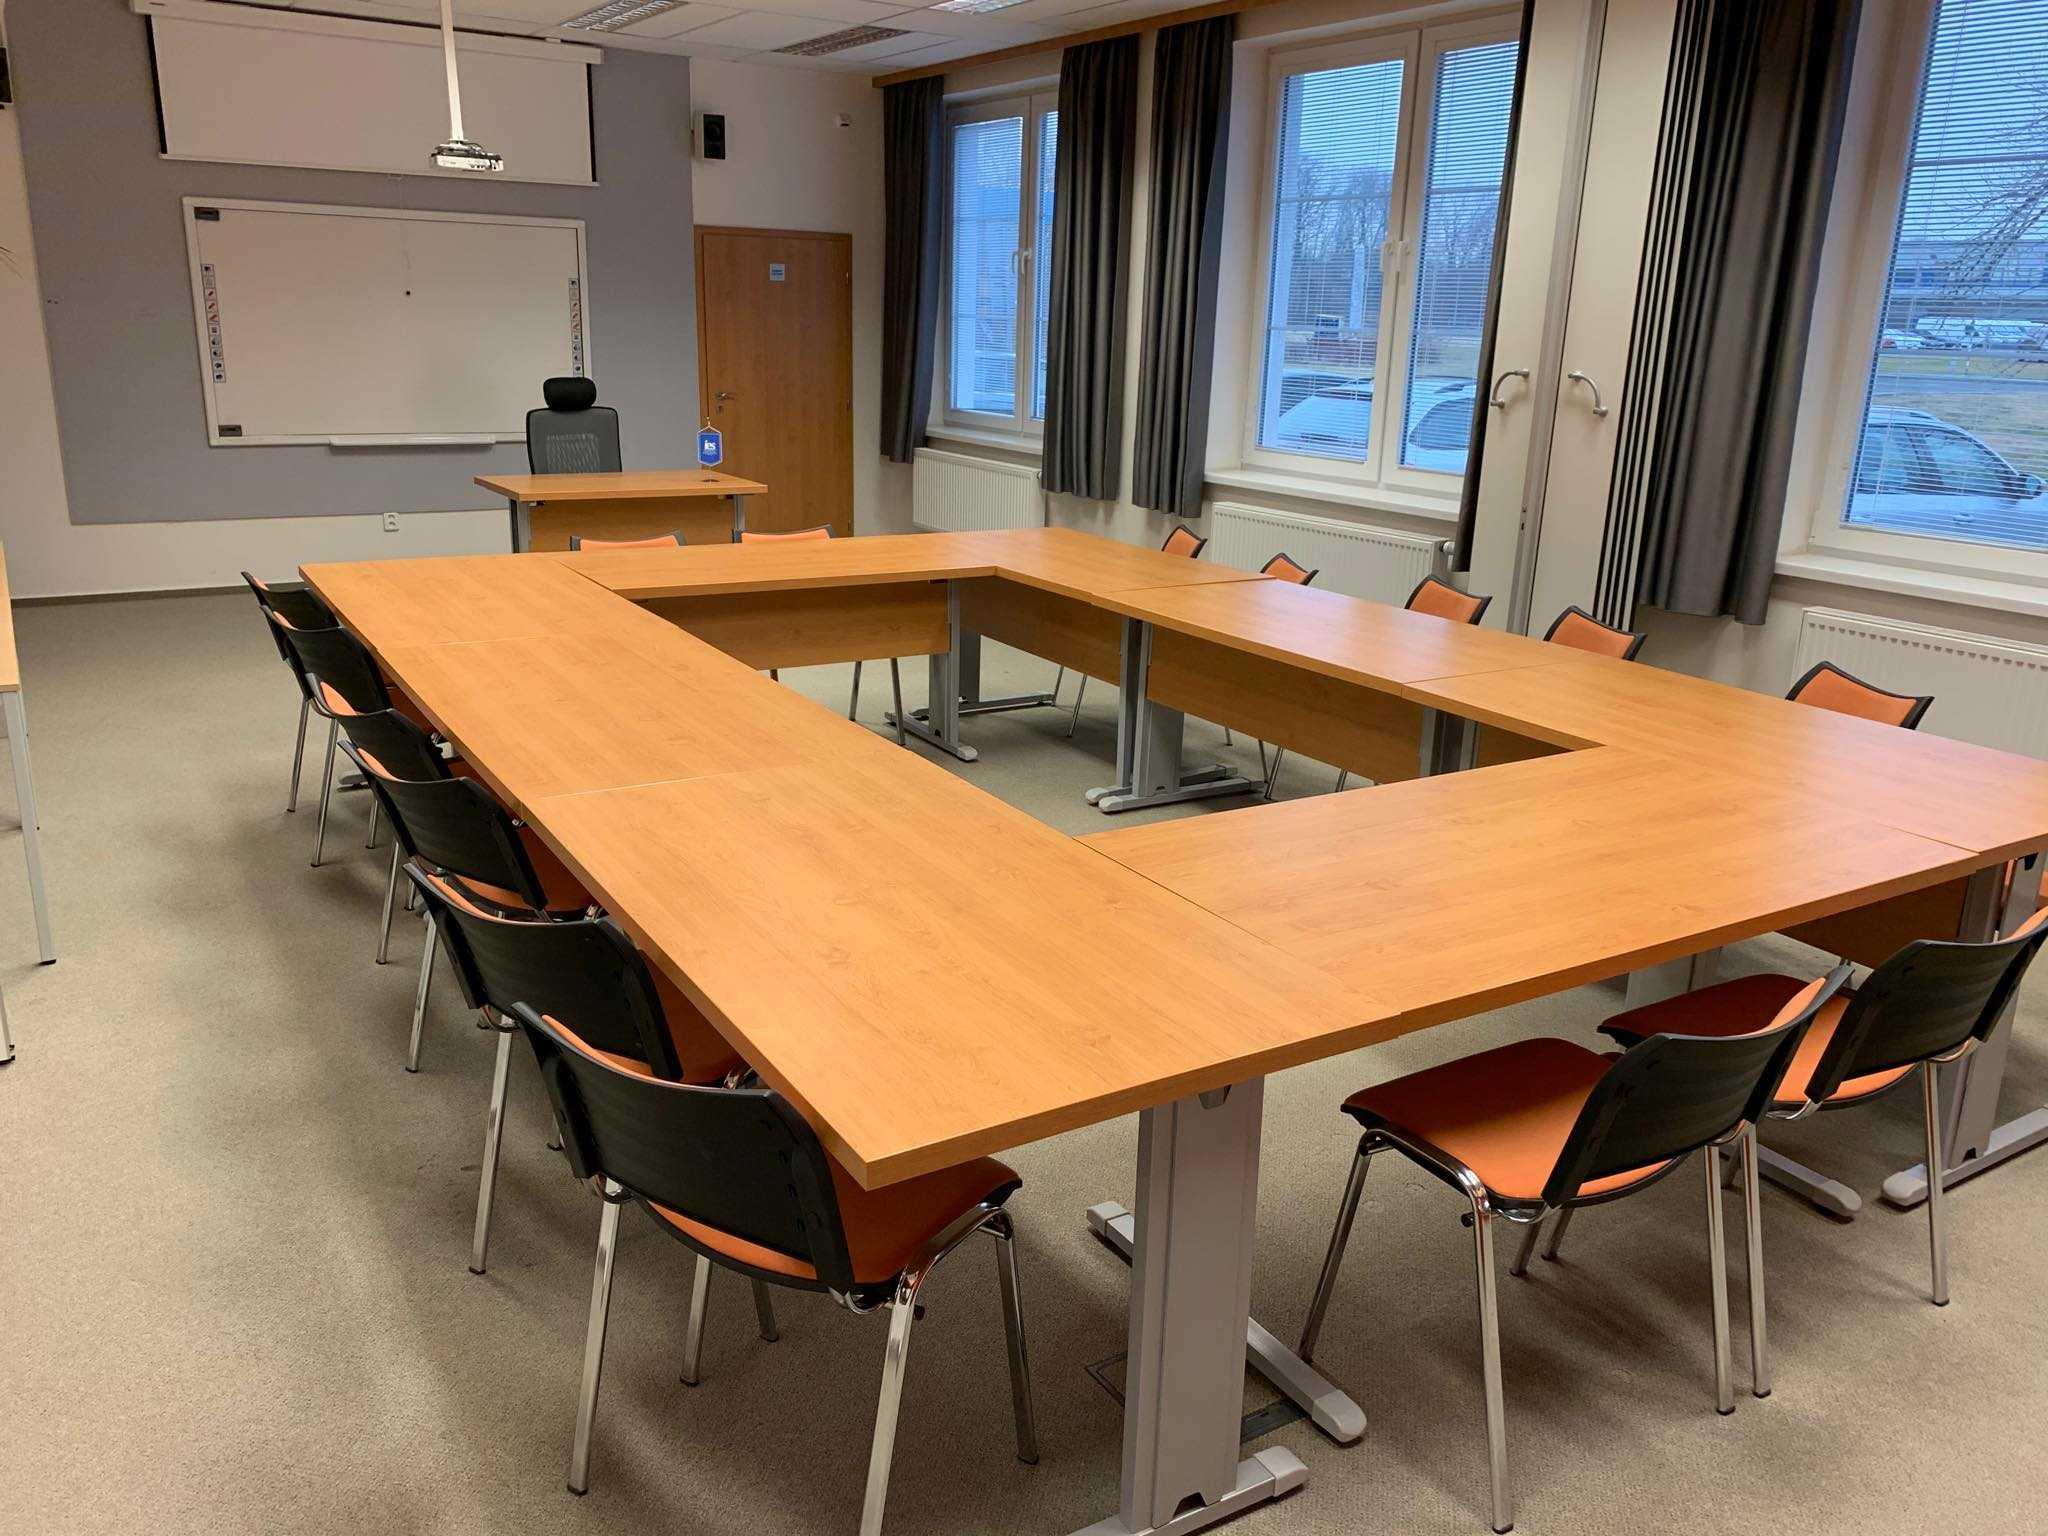 european-institute-of-business-studies-s-r-o_stredni-ucebna-geneva-1